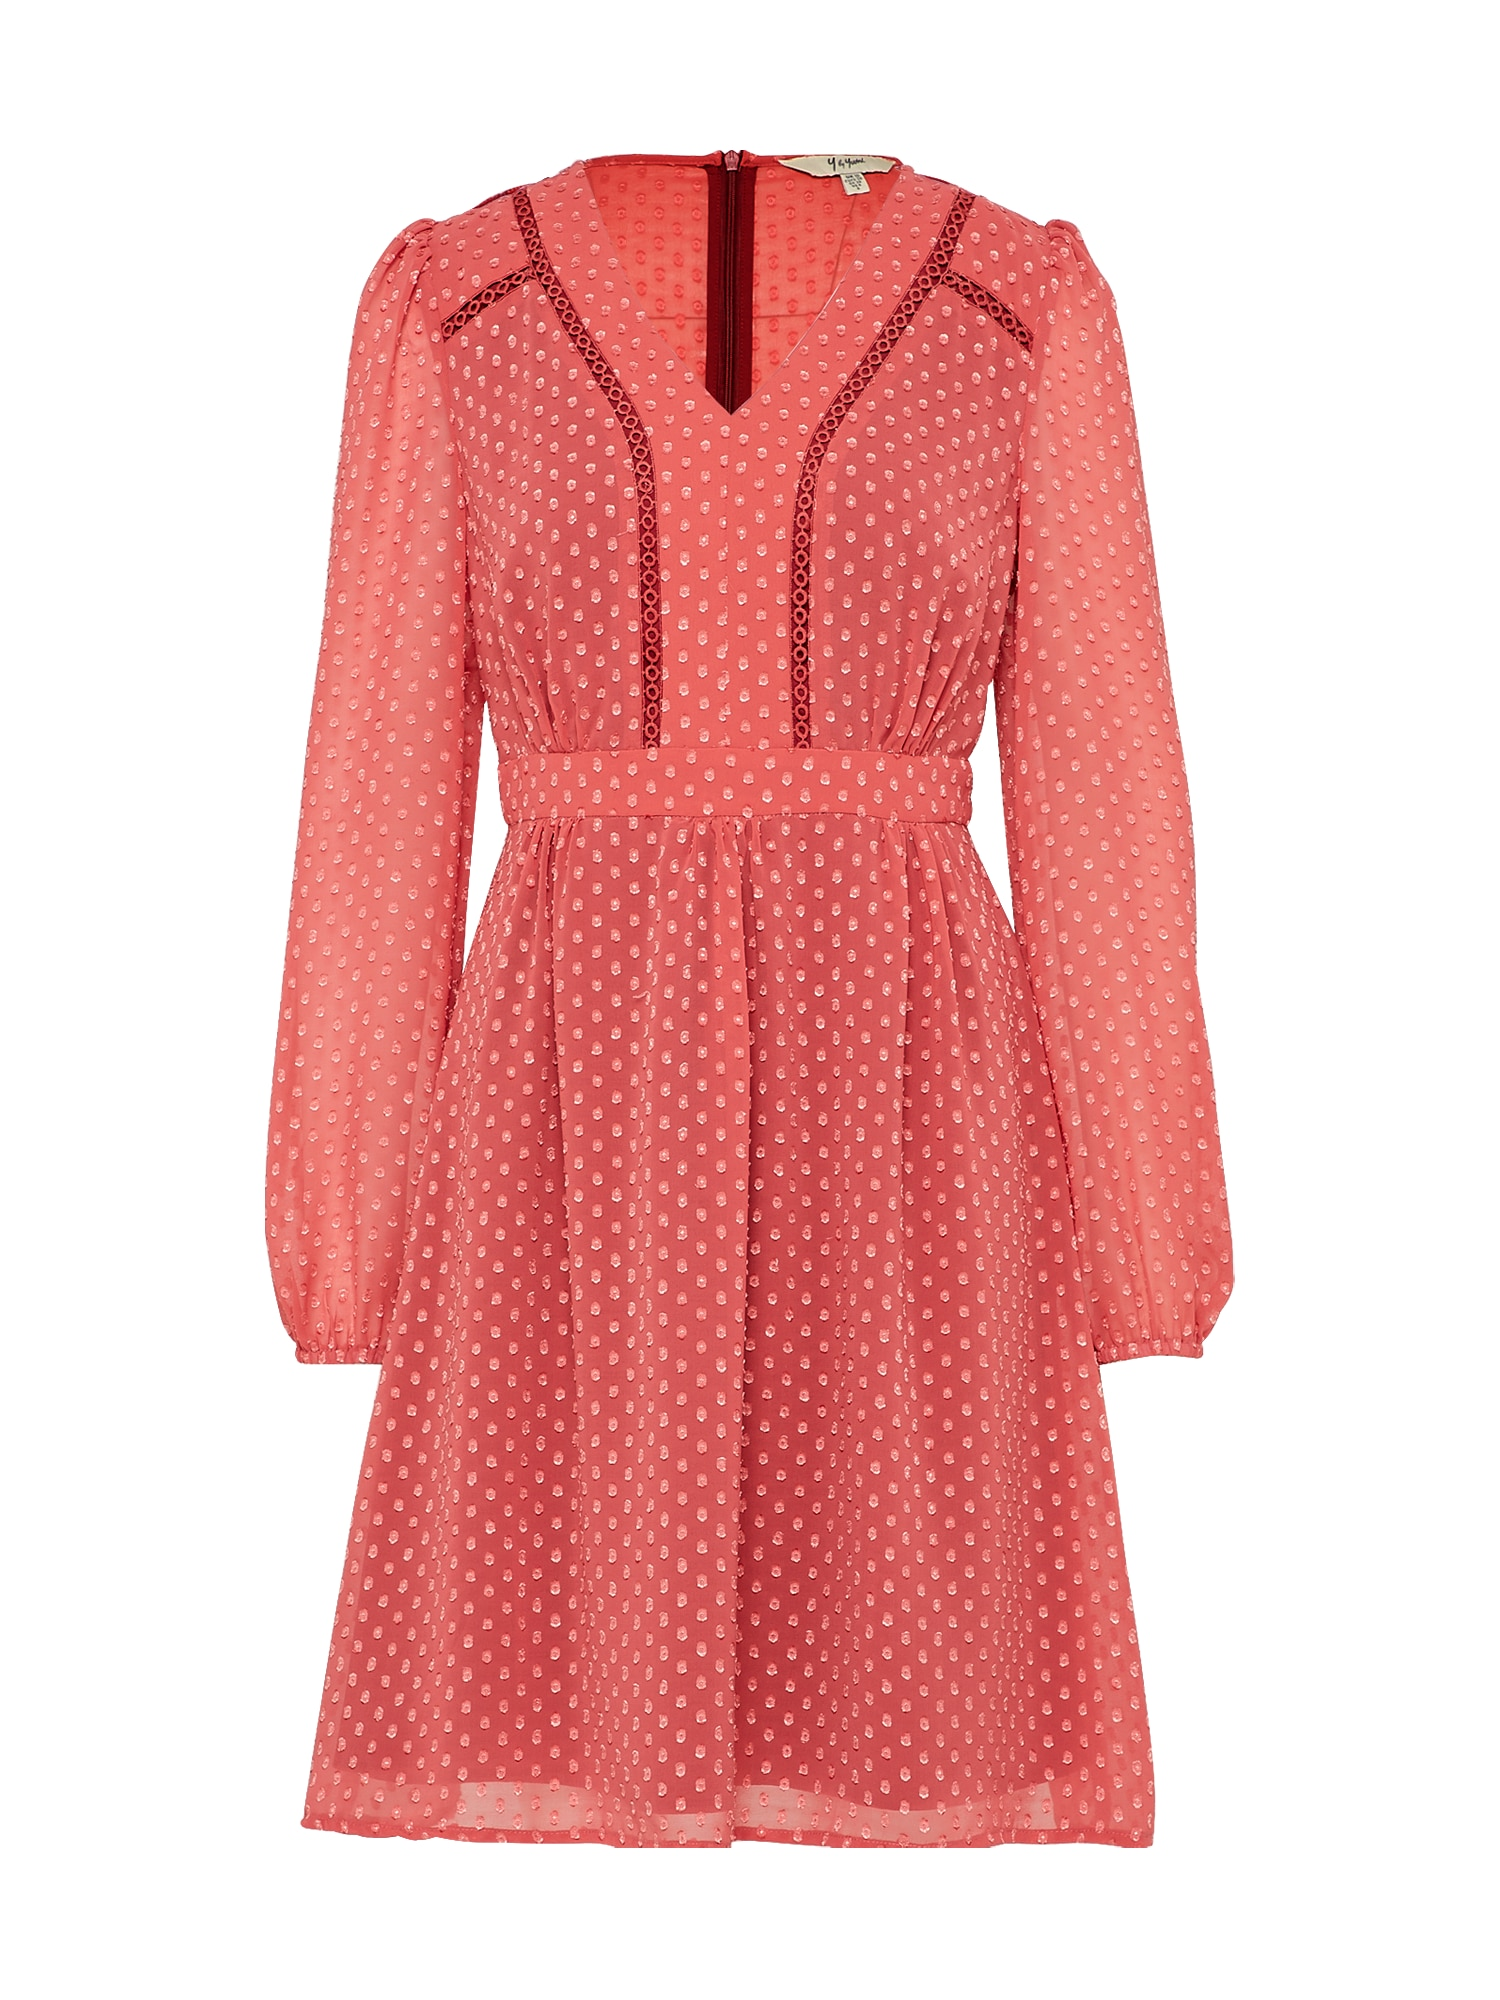 Šaty Dobby Spot meruňková Yumi